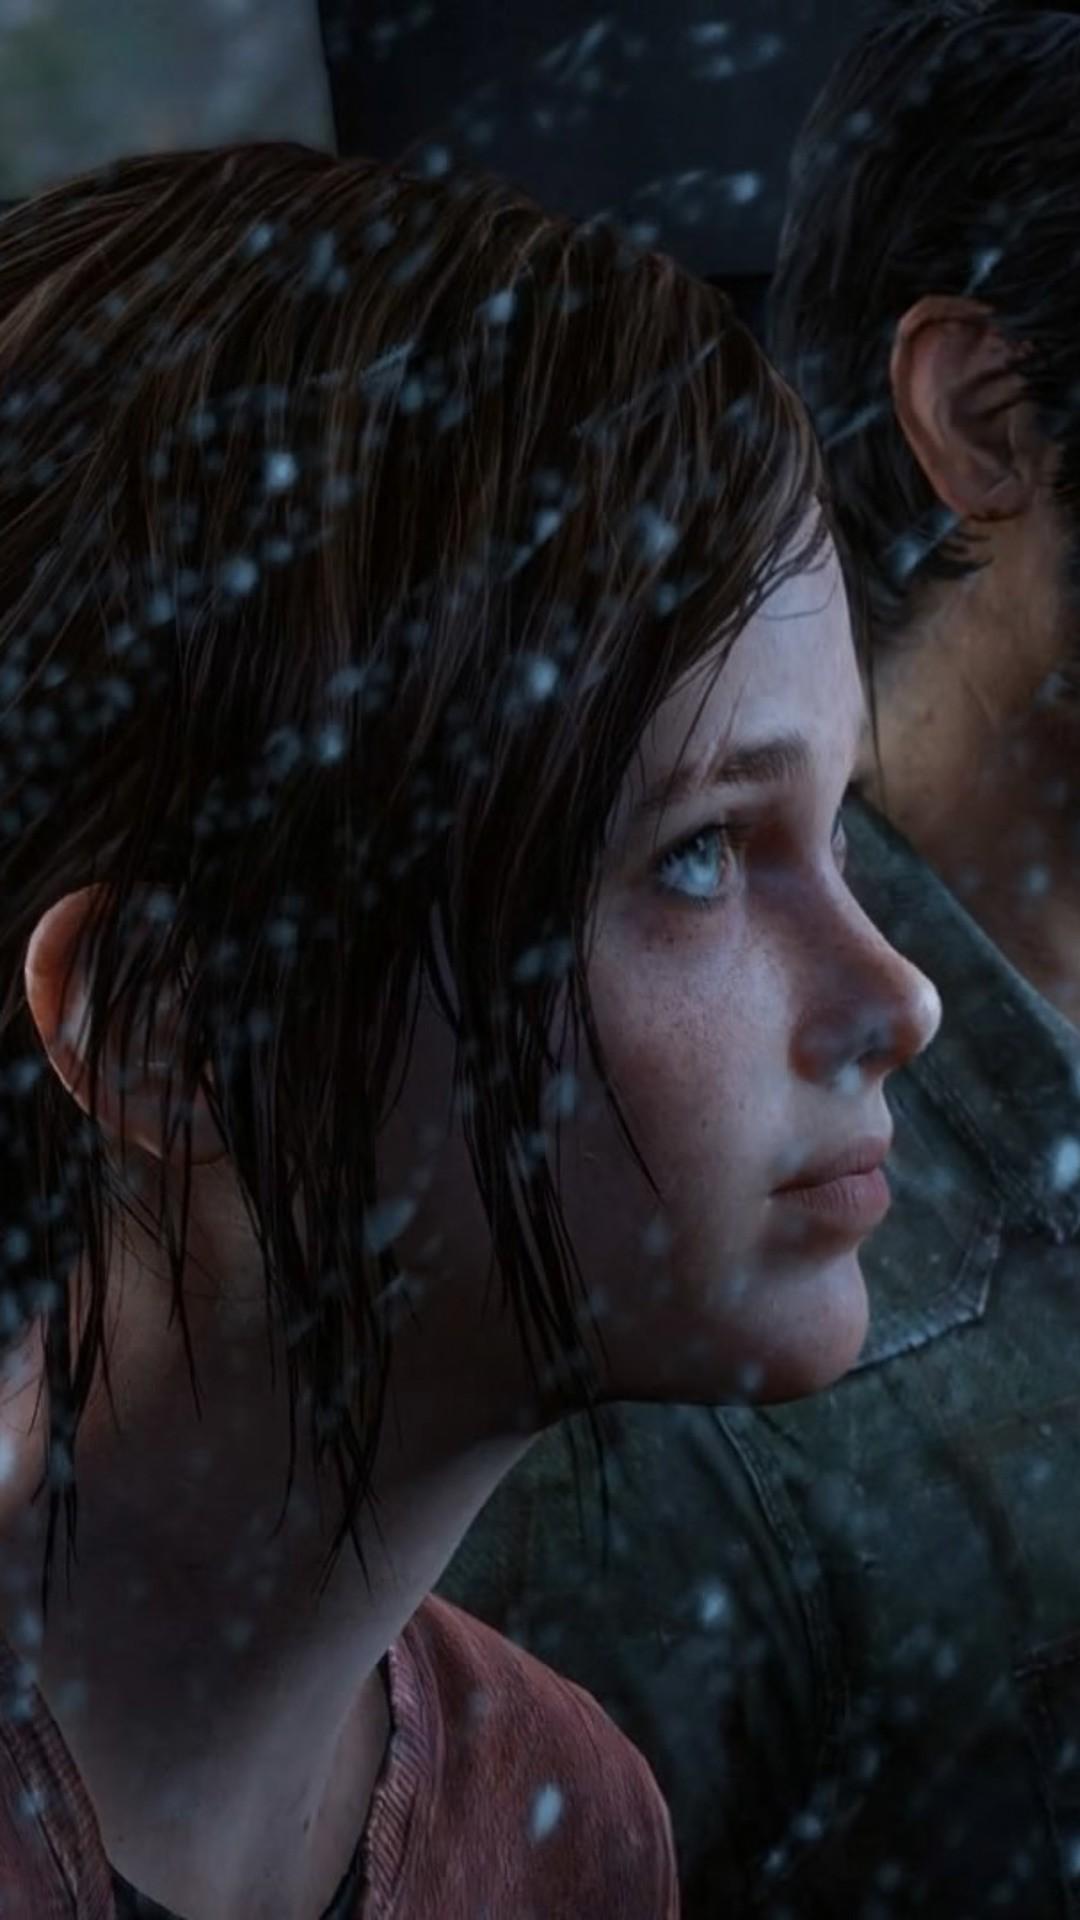 The Last Of Us lock screen wallpaper